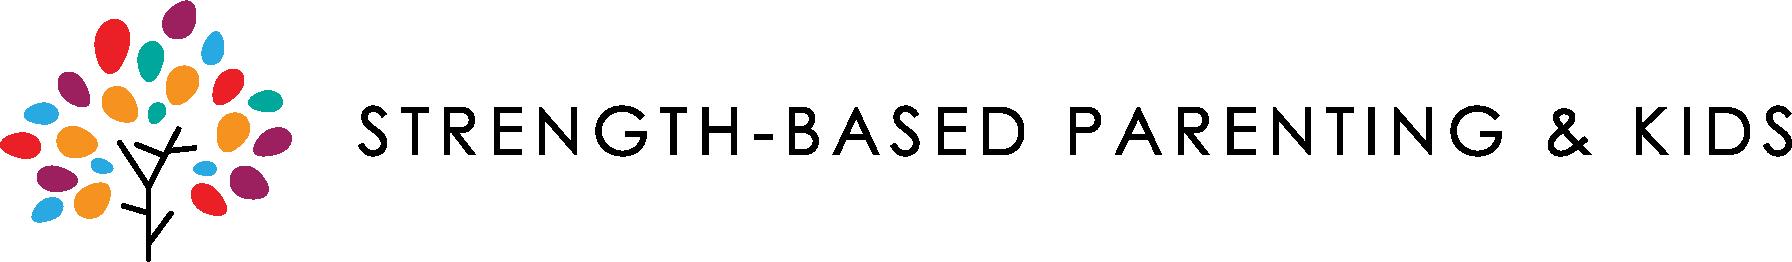 SPAK_horizontal_black.png